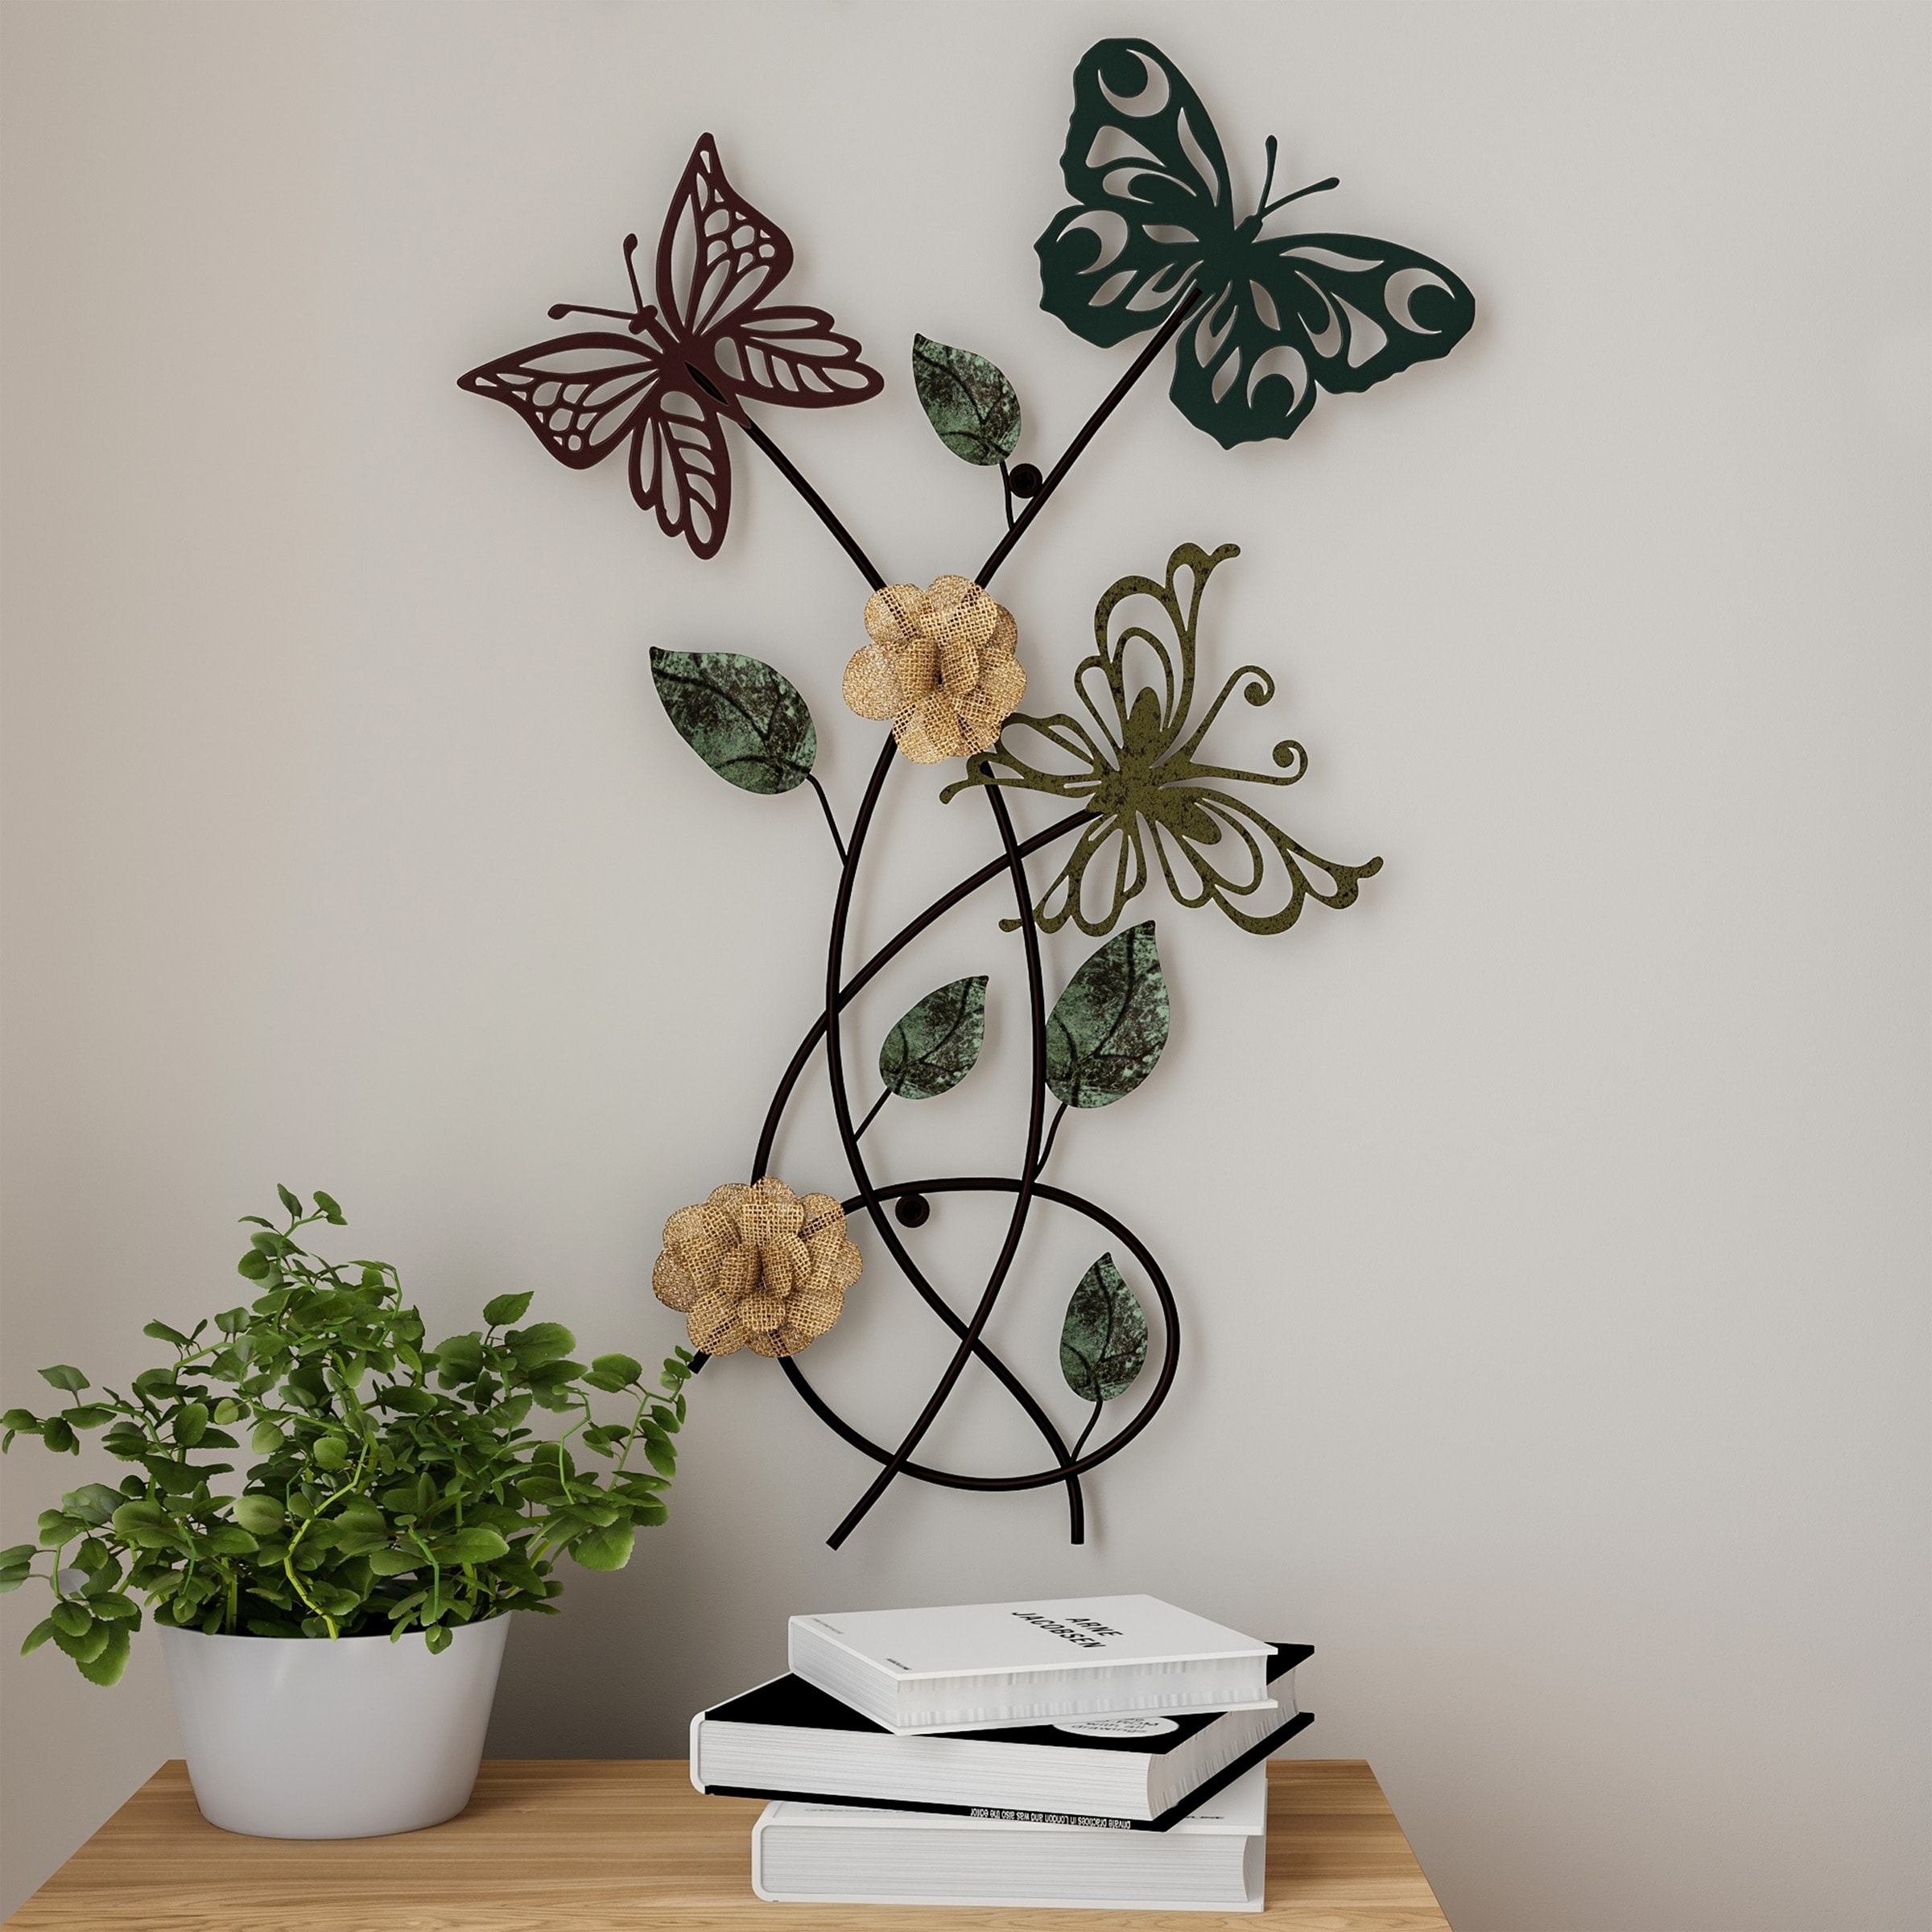 Garden Butterfly Metal Wall Art- Hand Painted Decorative 10D  Butterflies/Flowers for Modern Farmhouse by Lavish Home